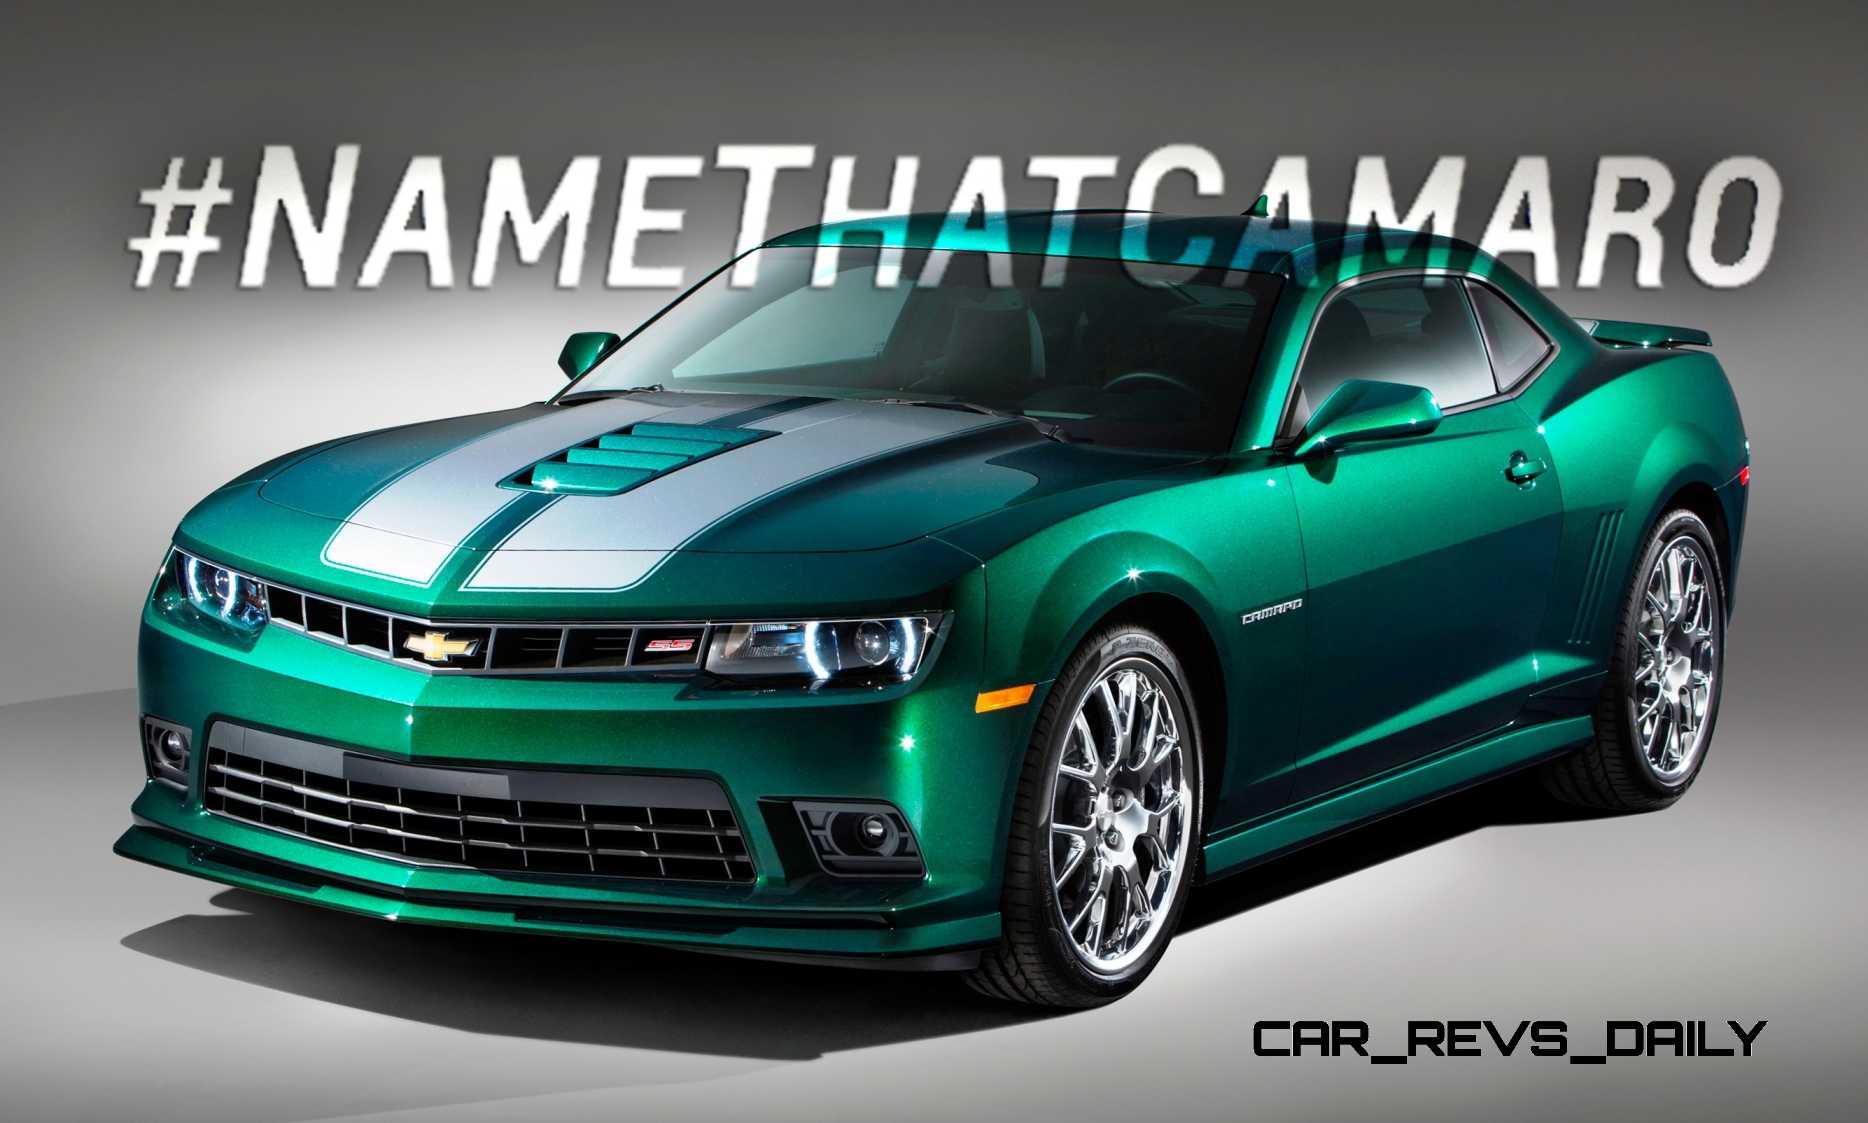 NameThatCamaro 2015 Chevrolet Camaro SS Emerald Green